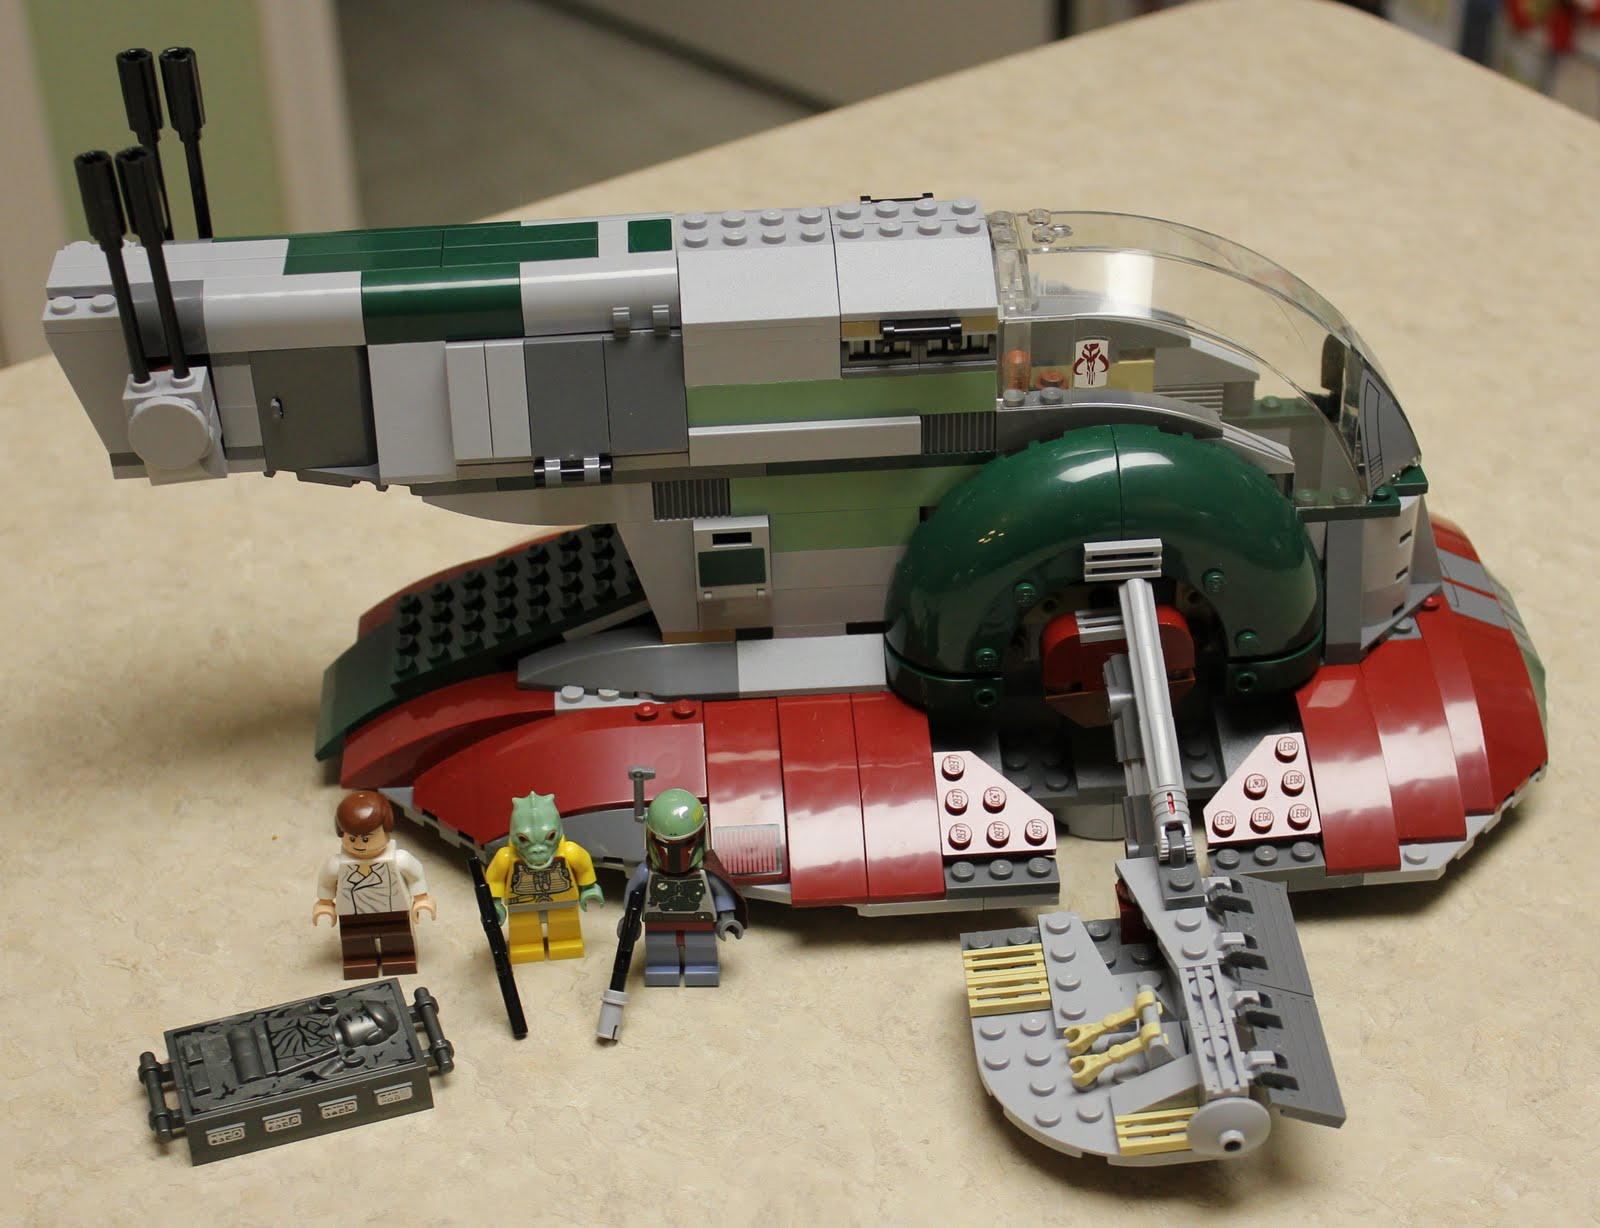 Sons Of Twilight Lego Star Wars Slave - 25 2 lego star wars minifigures han solo han in carbonite blaster